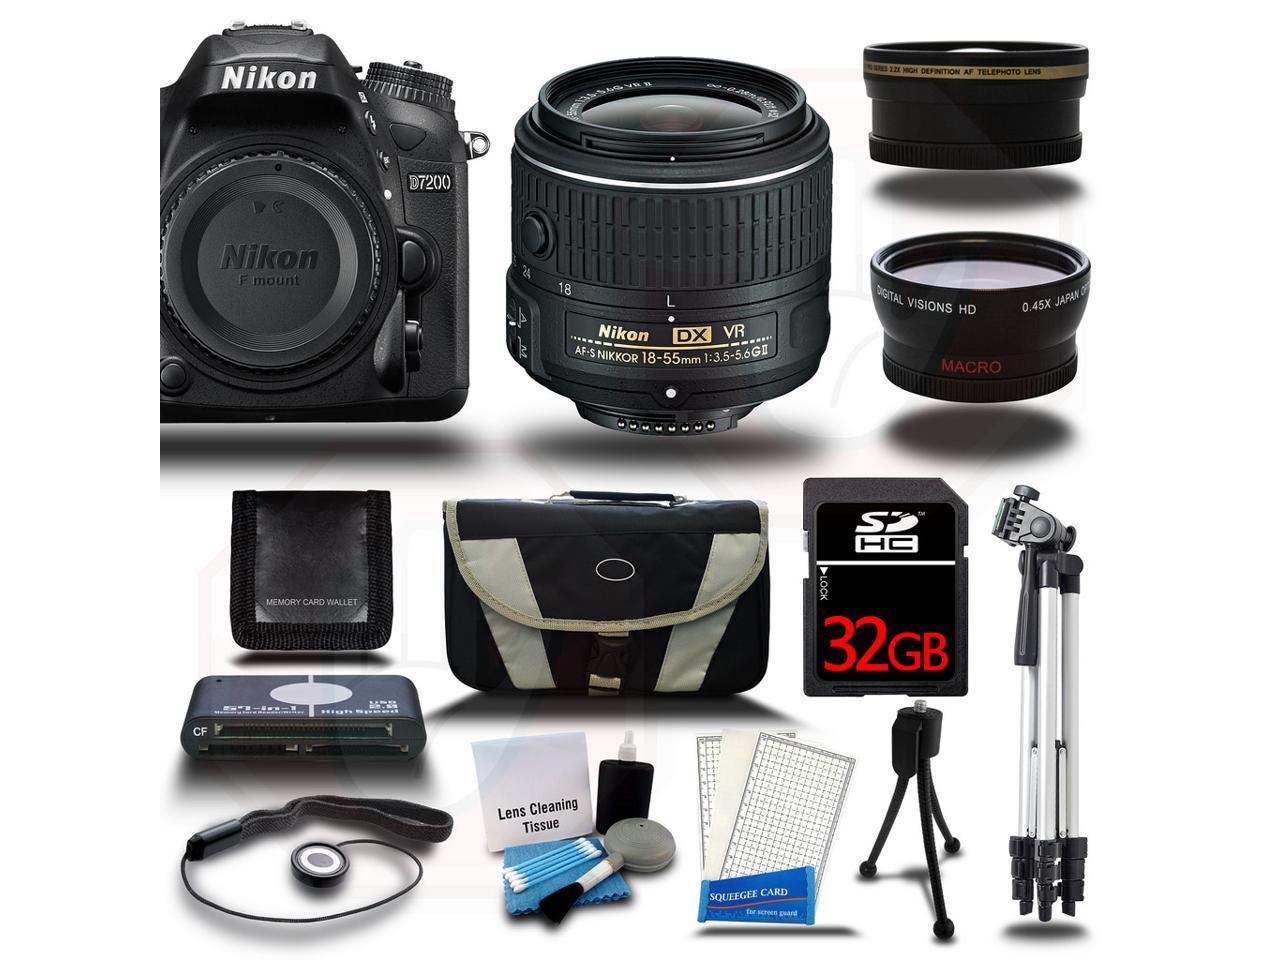 Nikon D7200 DSLR Camera Body 13PC 3 Lens Kit Bundle + 18-55mm VR + Wide-Angle + Tele Photo + 32GB + Card Reader + Case & More New - Newegg.com